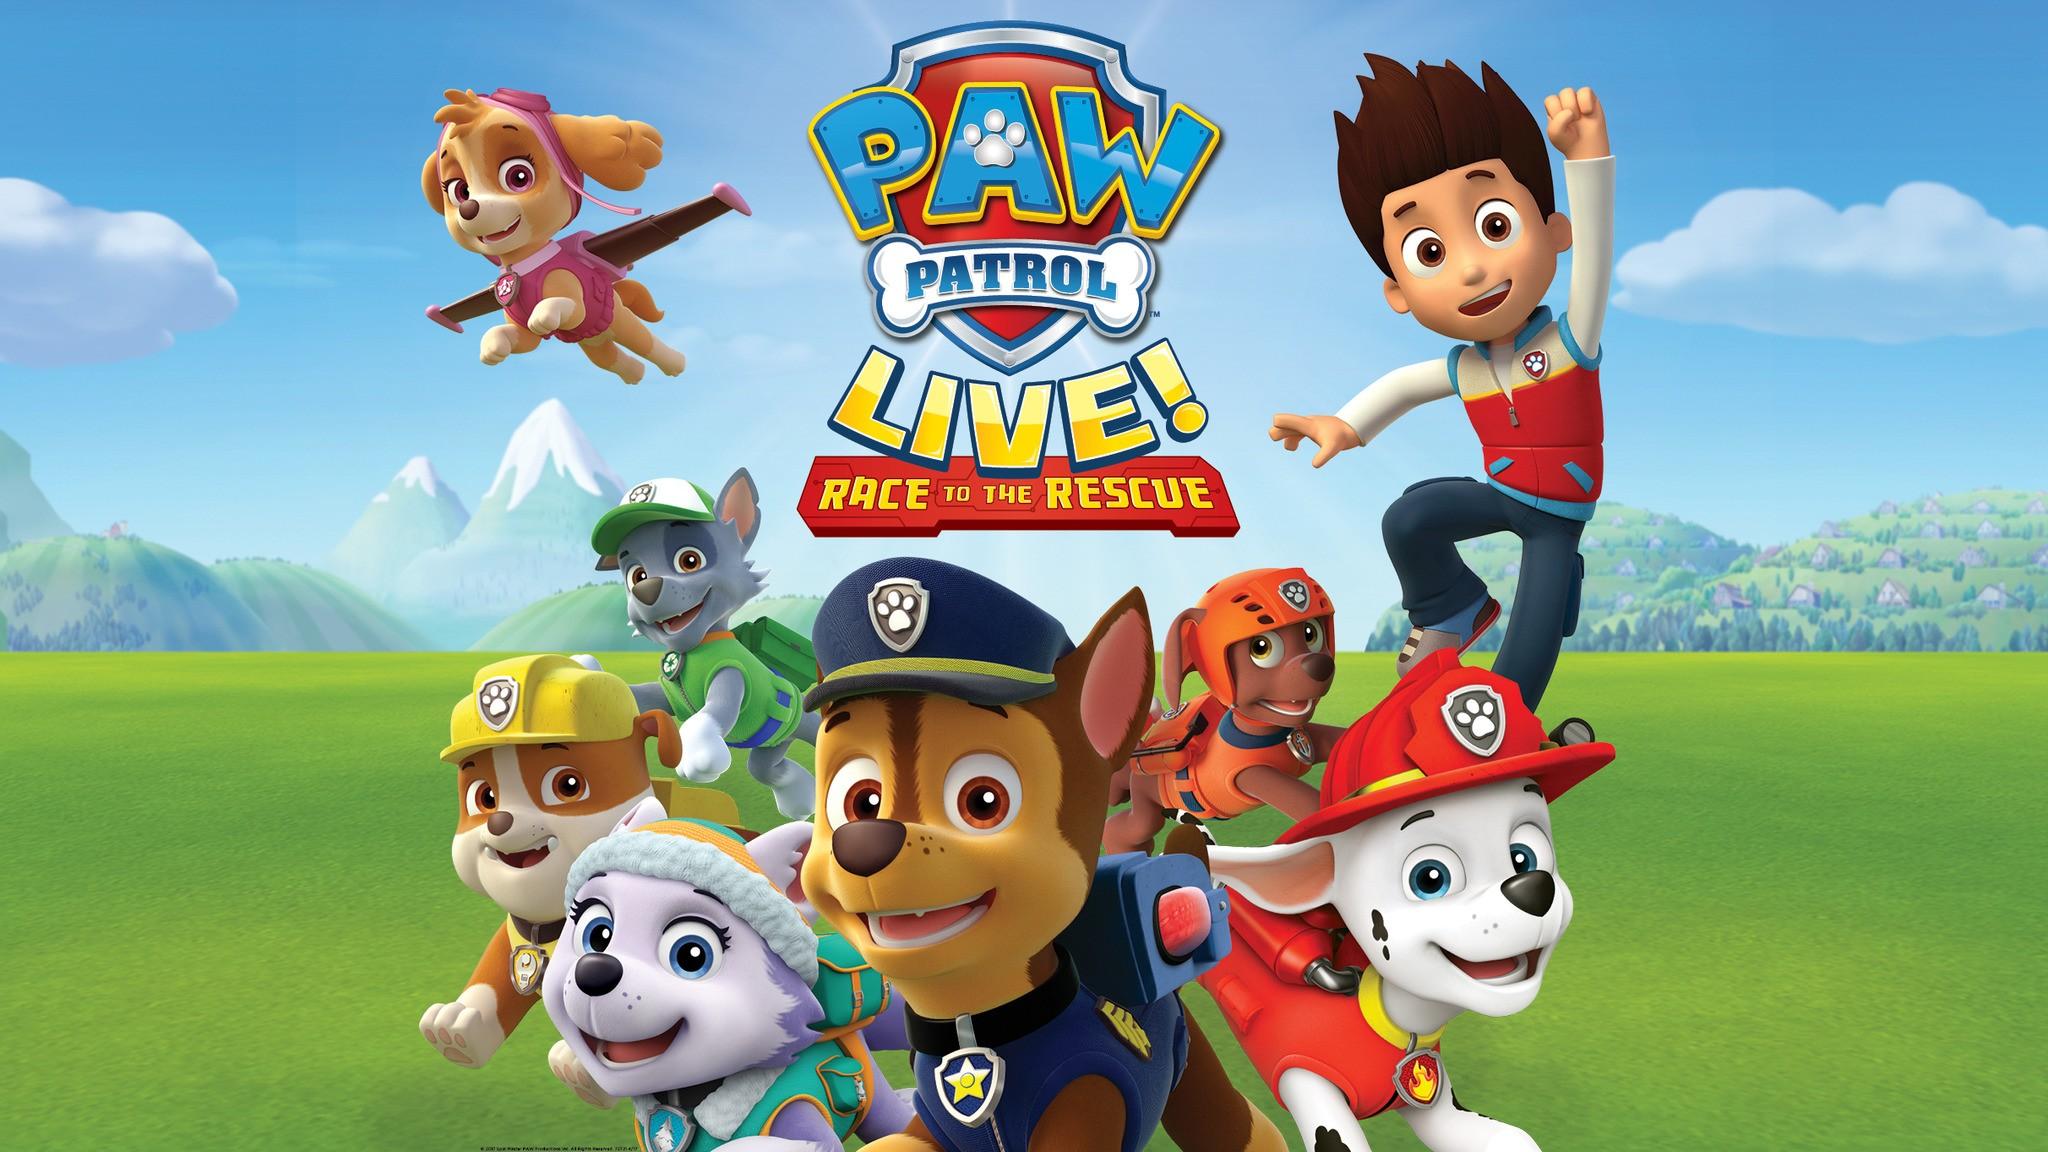 Paw Patrol HD Wallpaper 64881